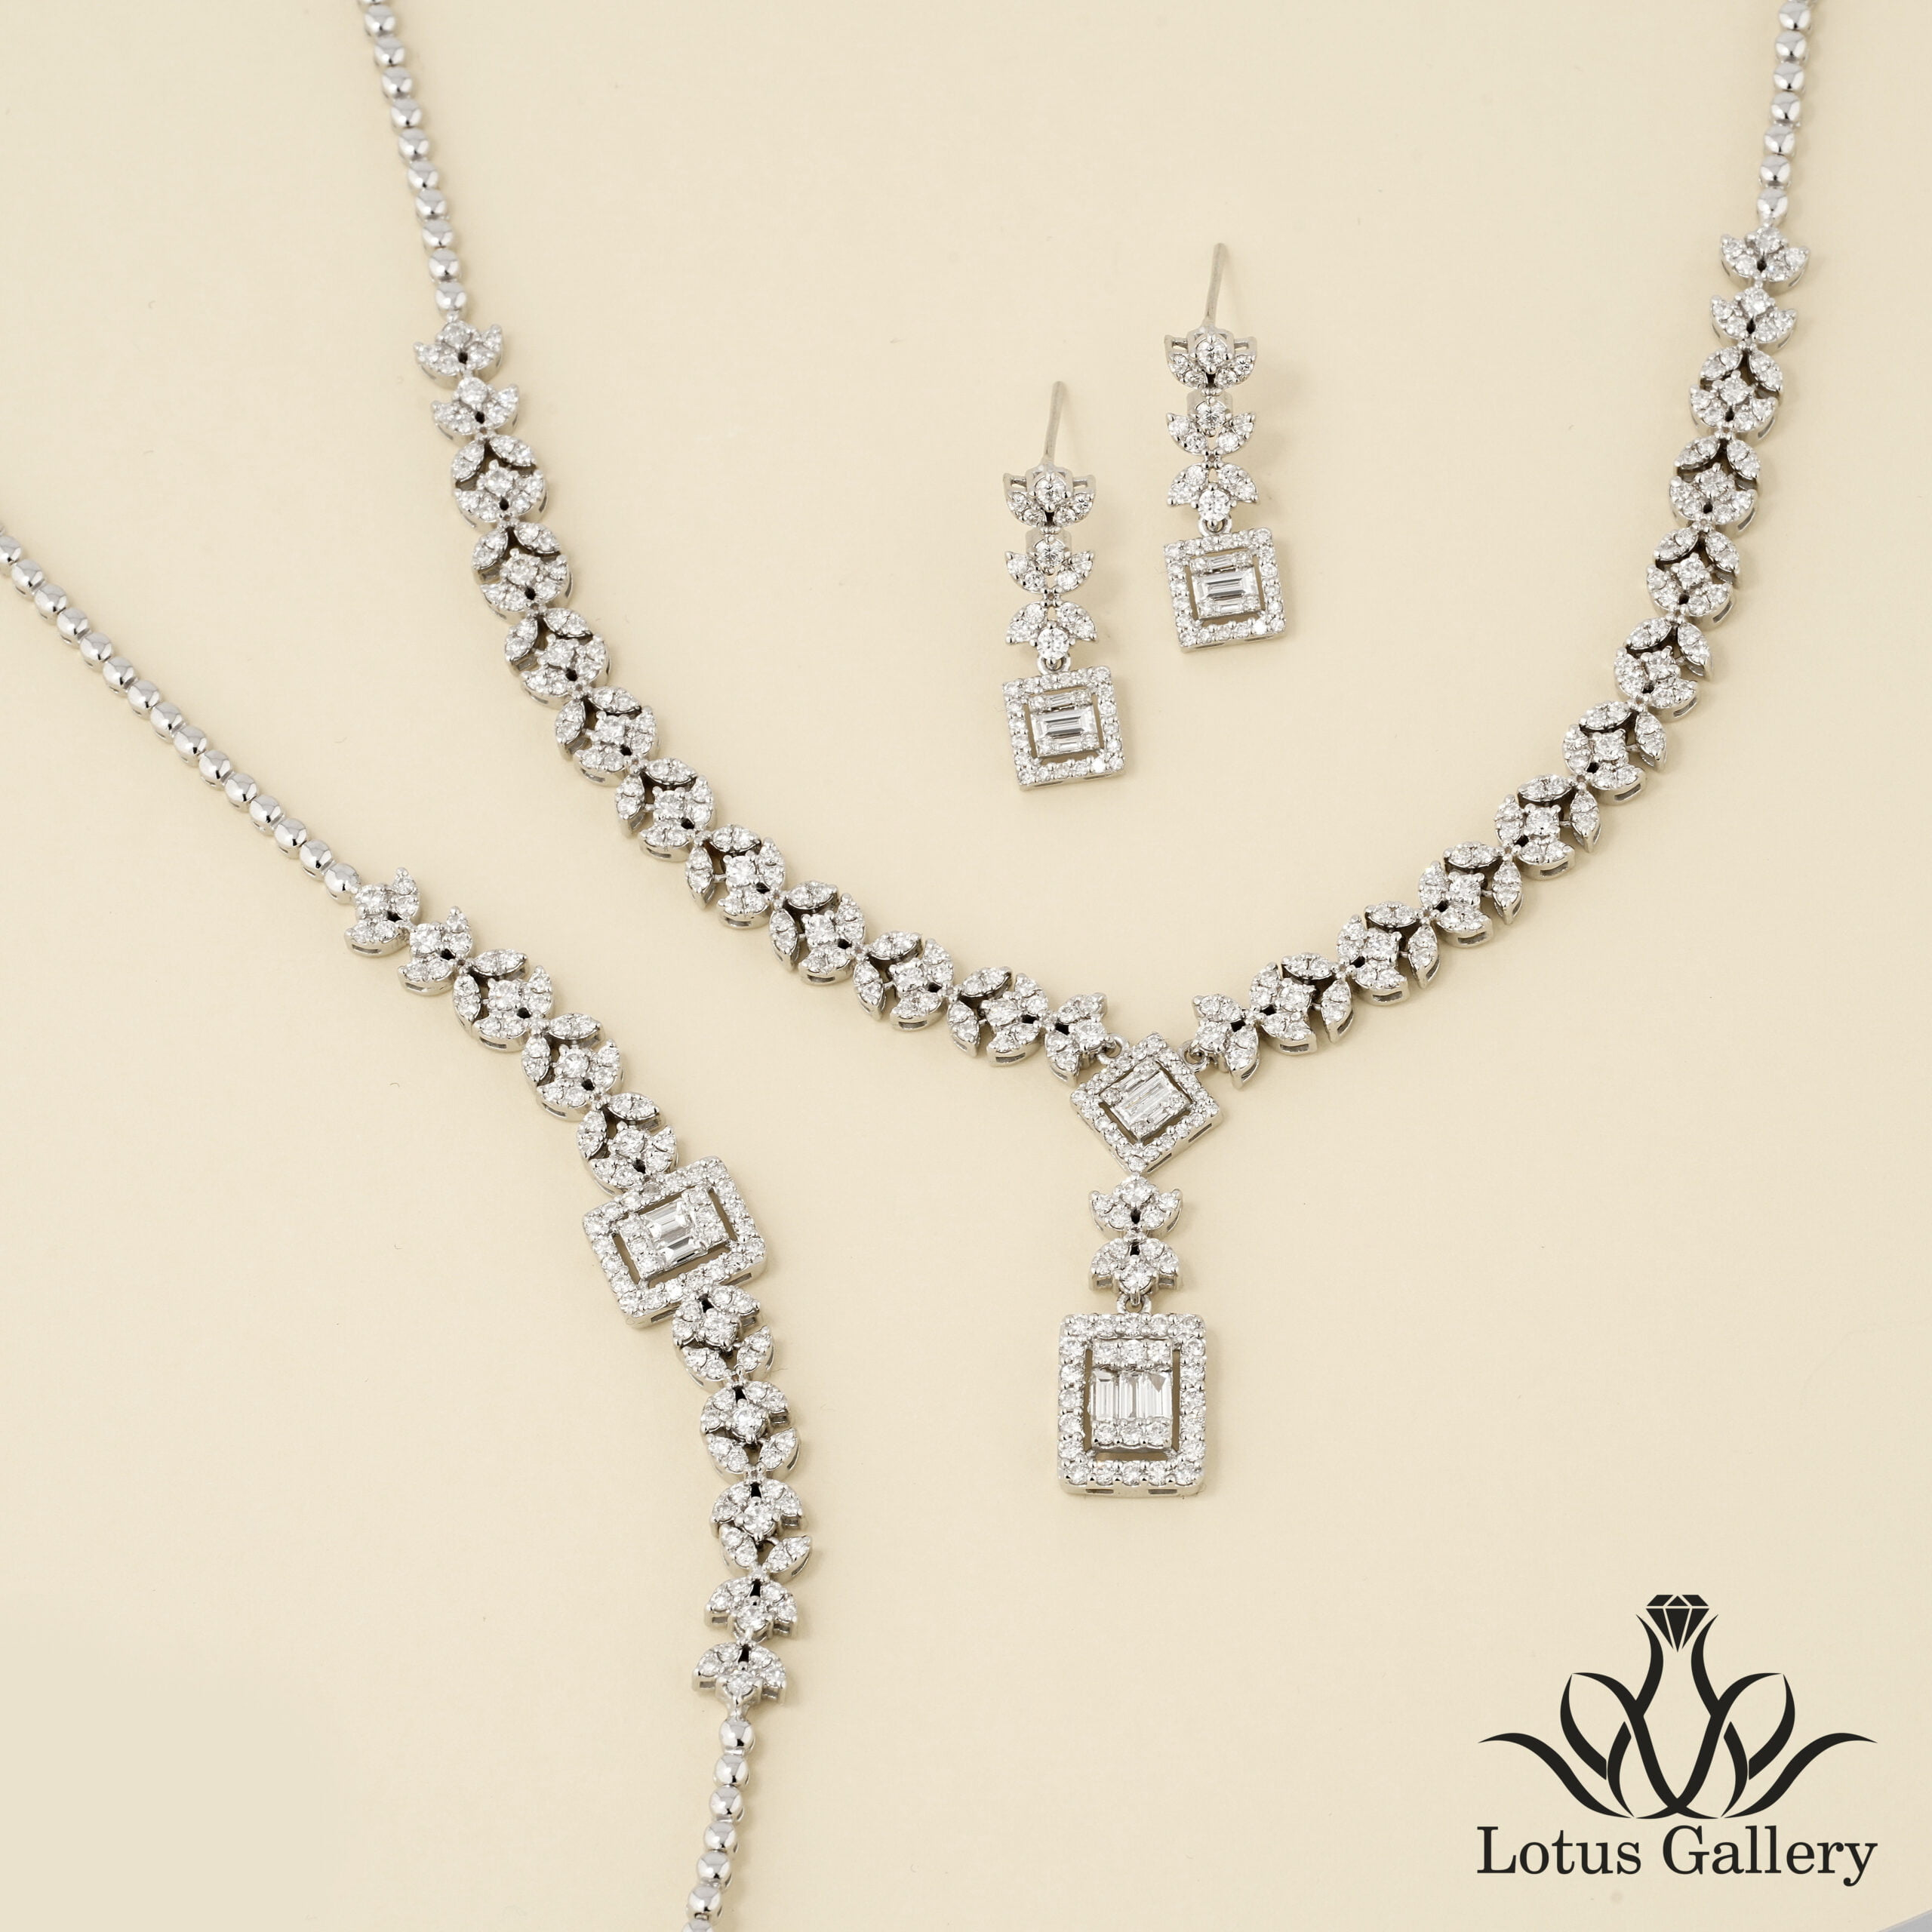 سرویس باگت و برلیان جواهر